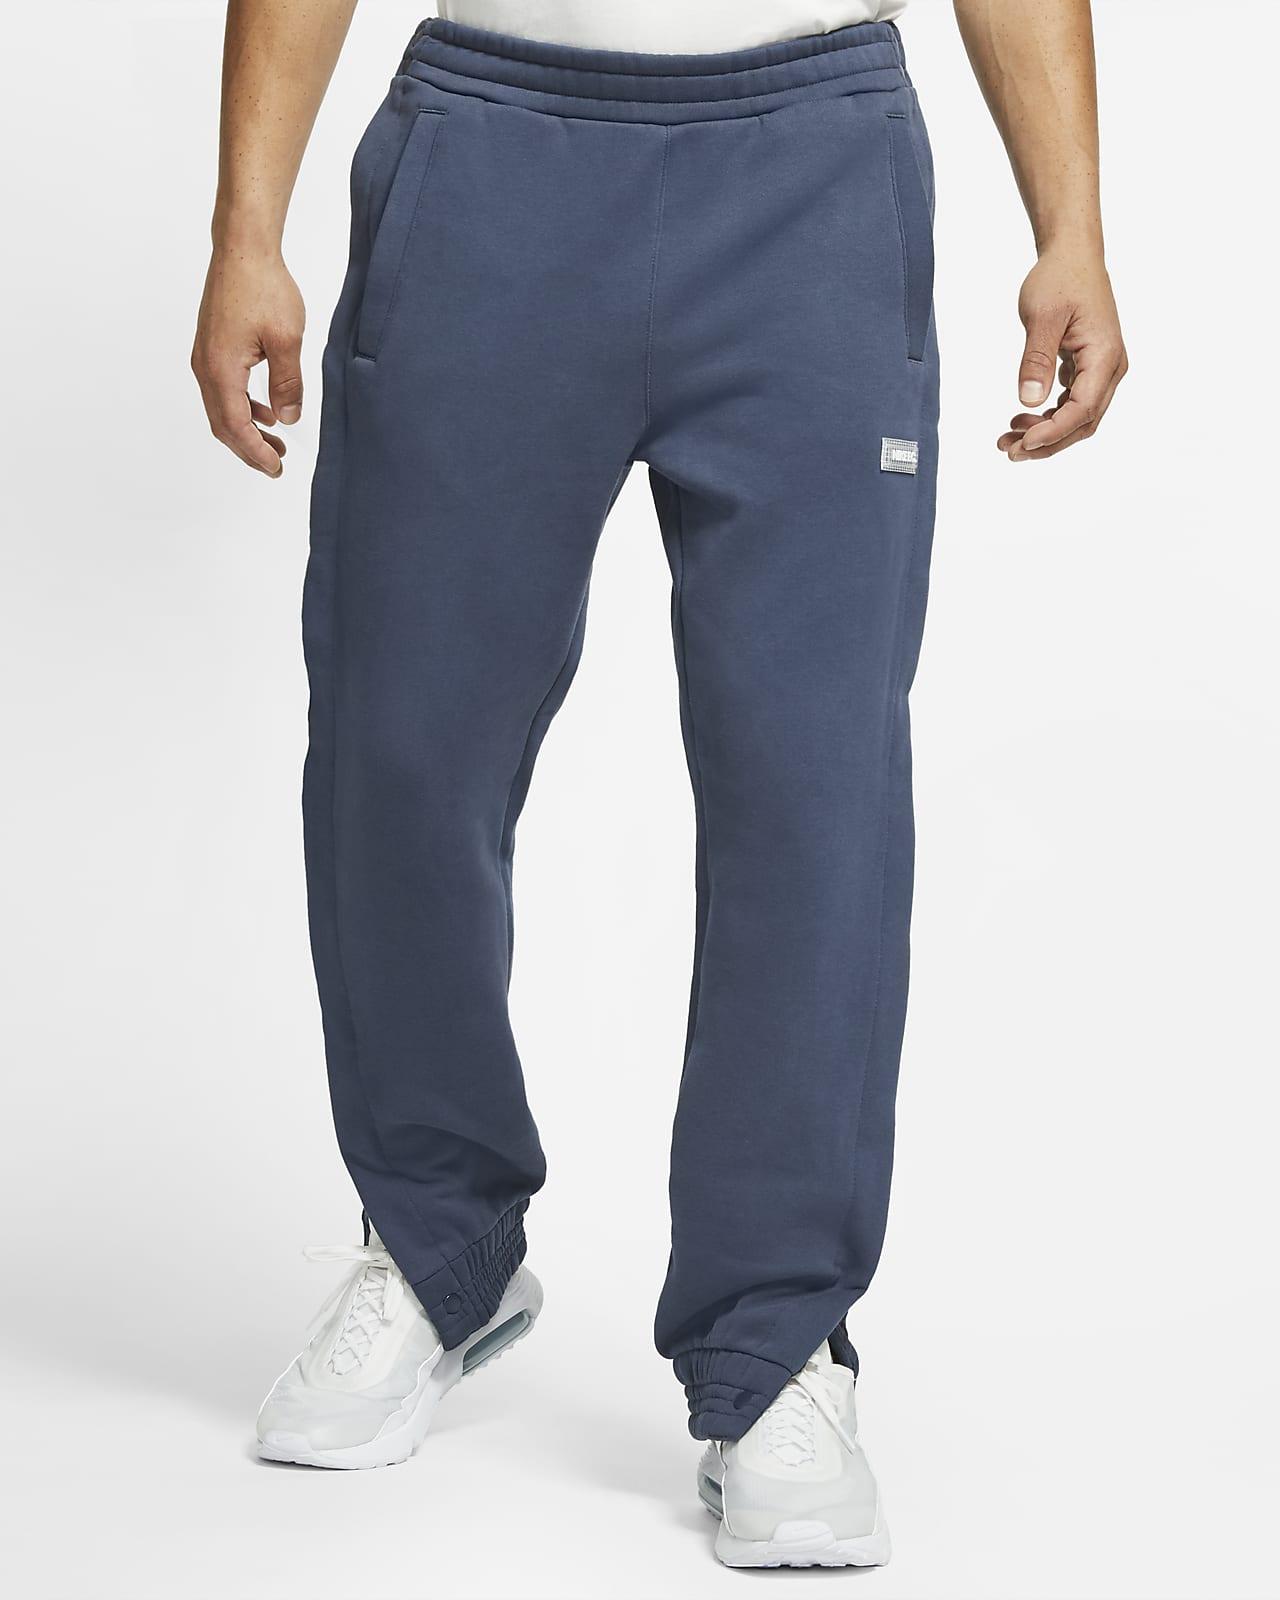 Nike F.C. Men's Fleece Soccer Pants